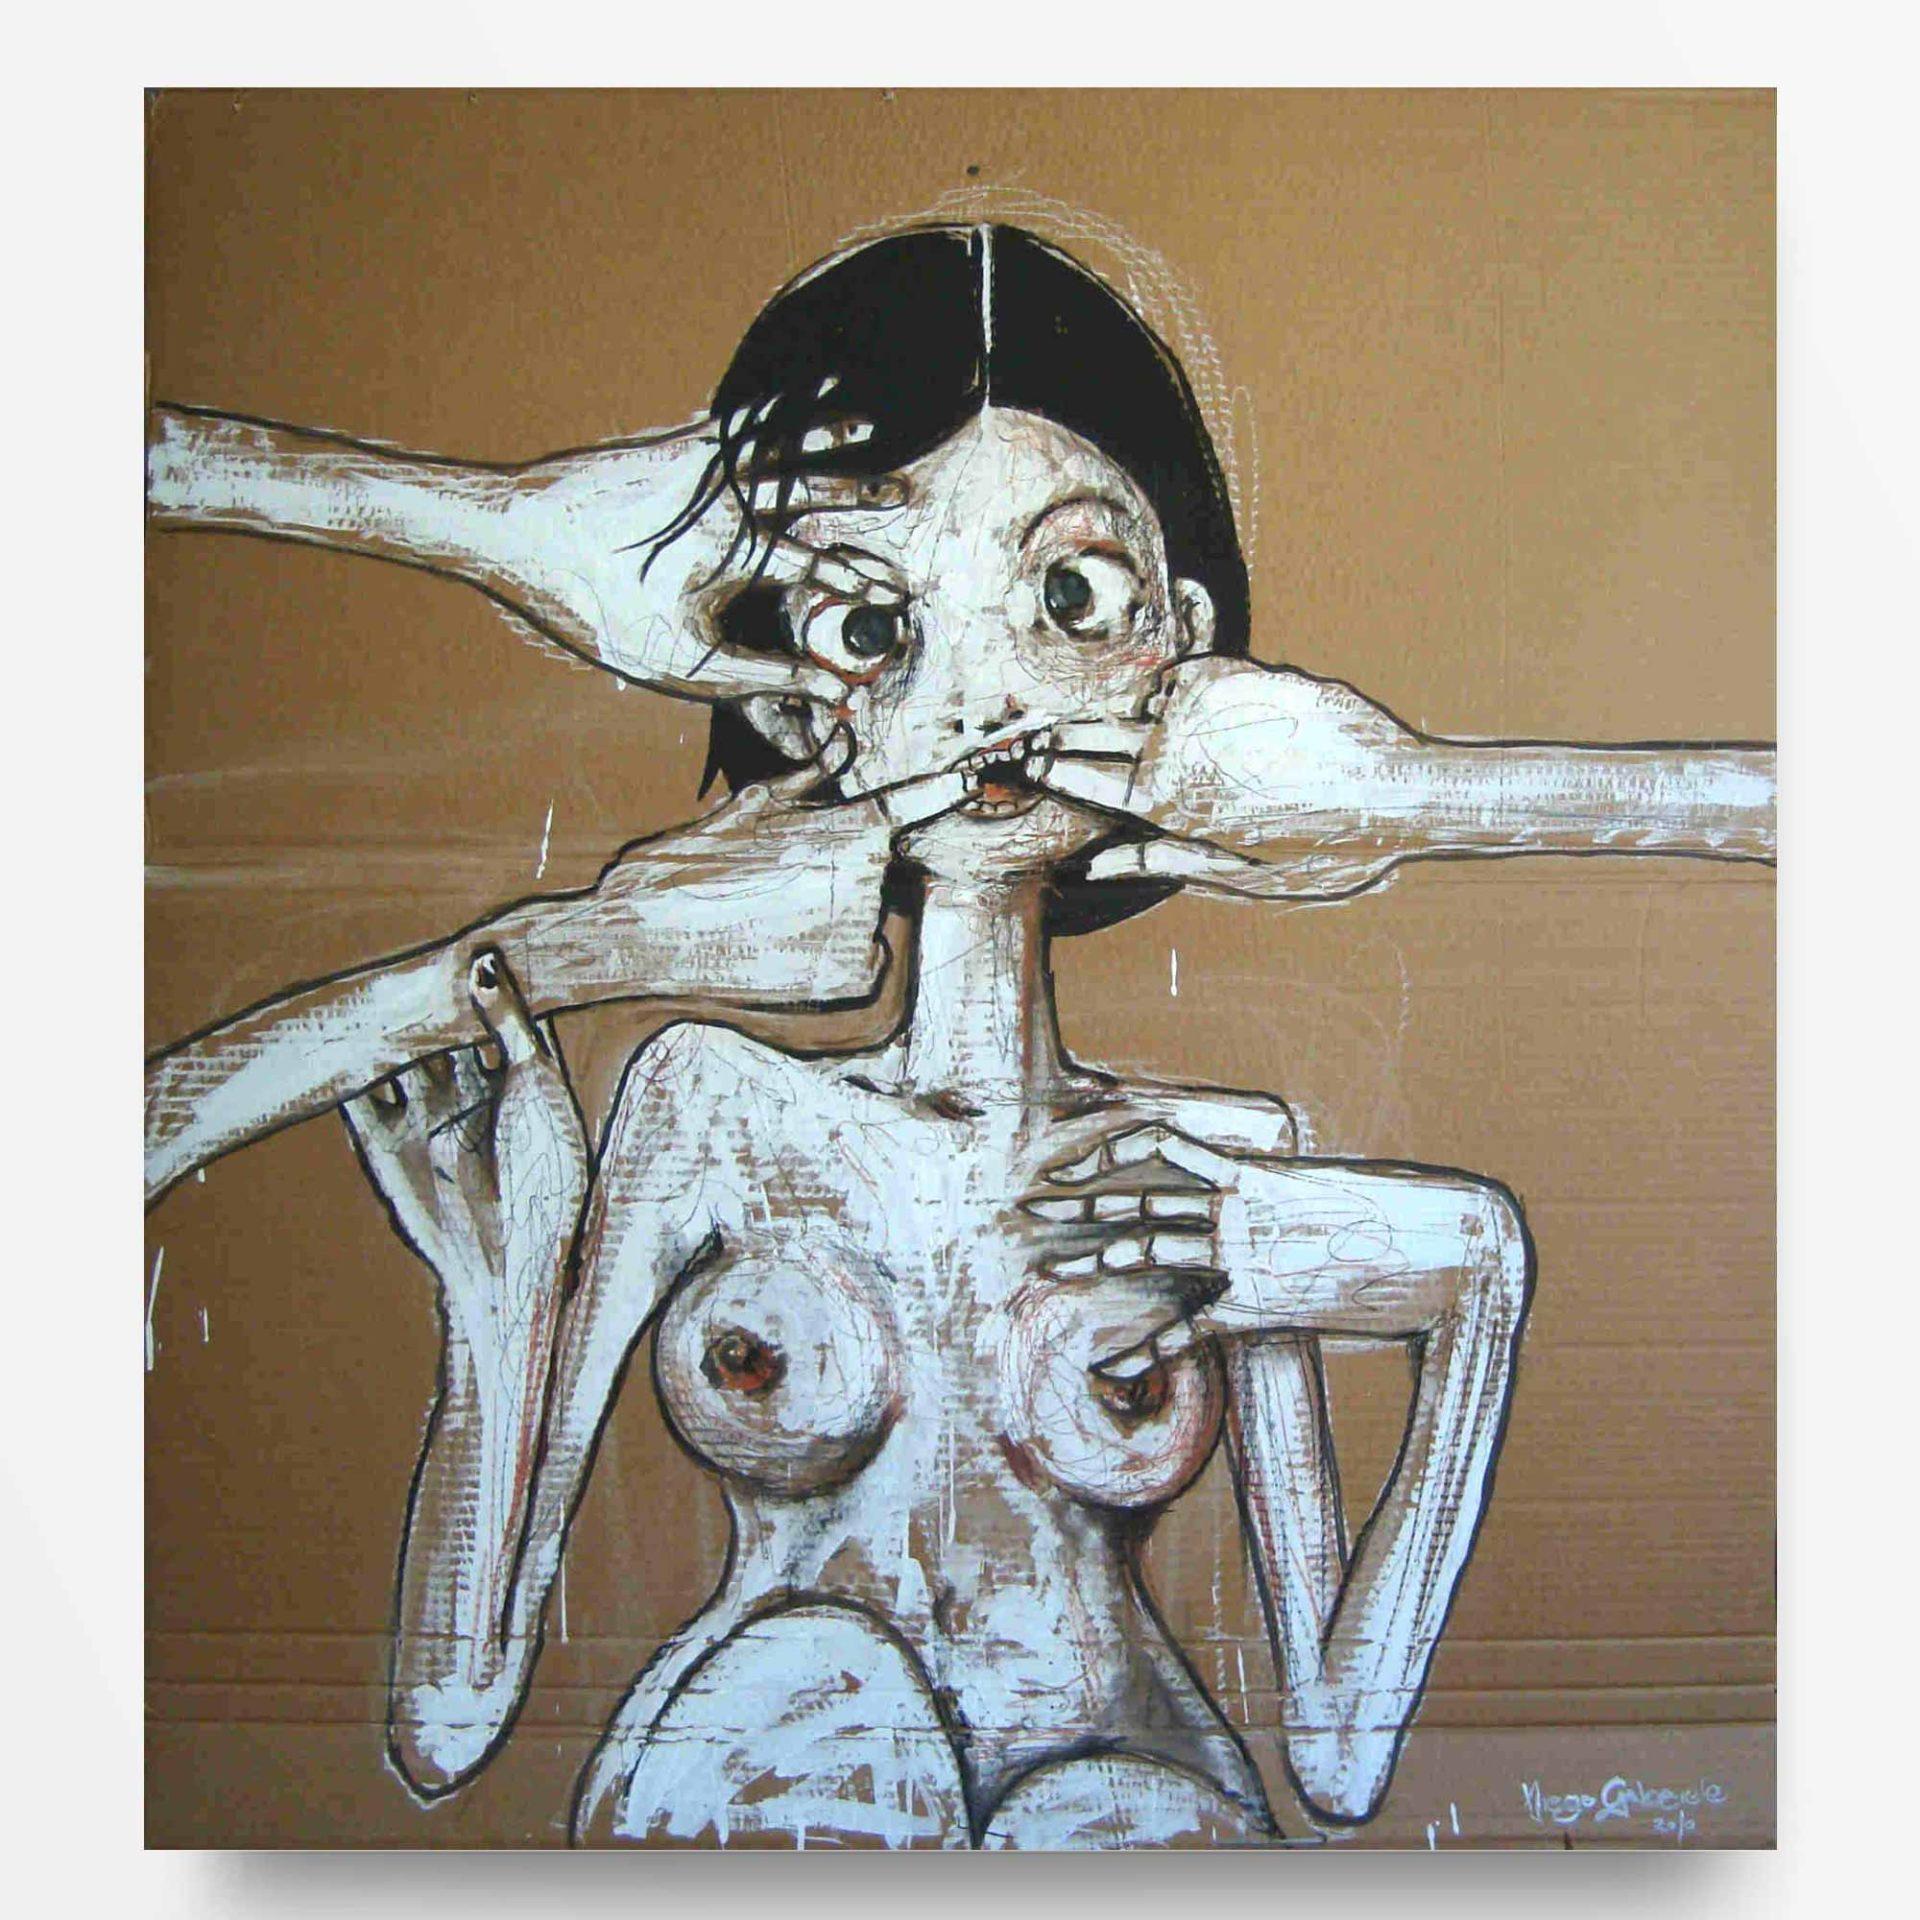 lowbrow art Incredulità quadro ad acrilico Diego Gabriele